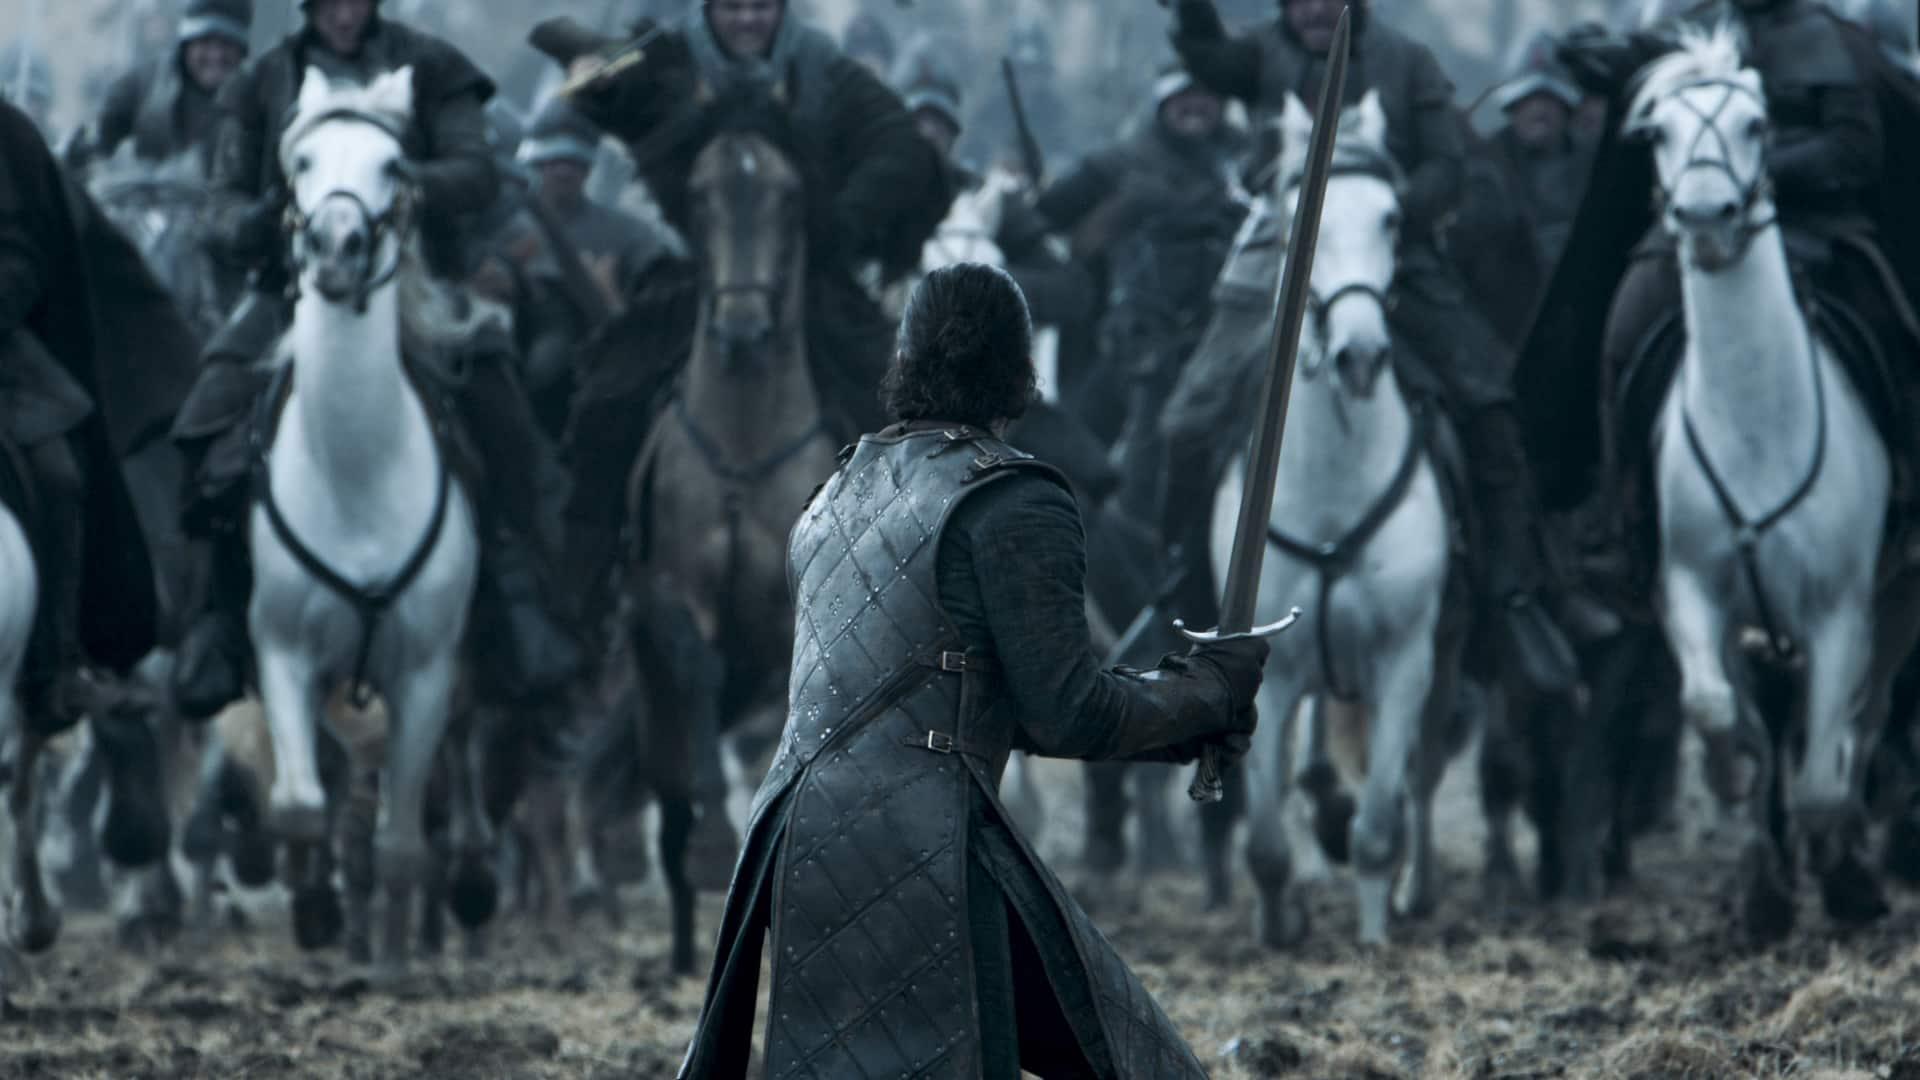 Jon Snow v Battle of Bastards